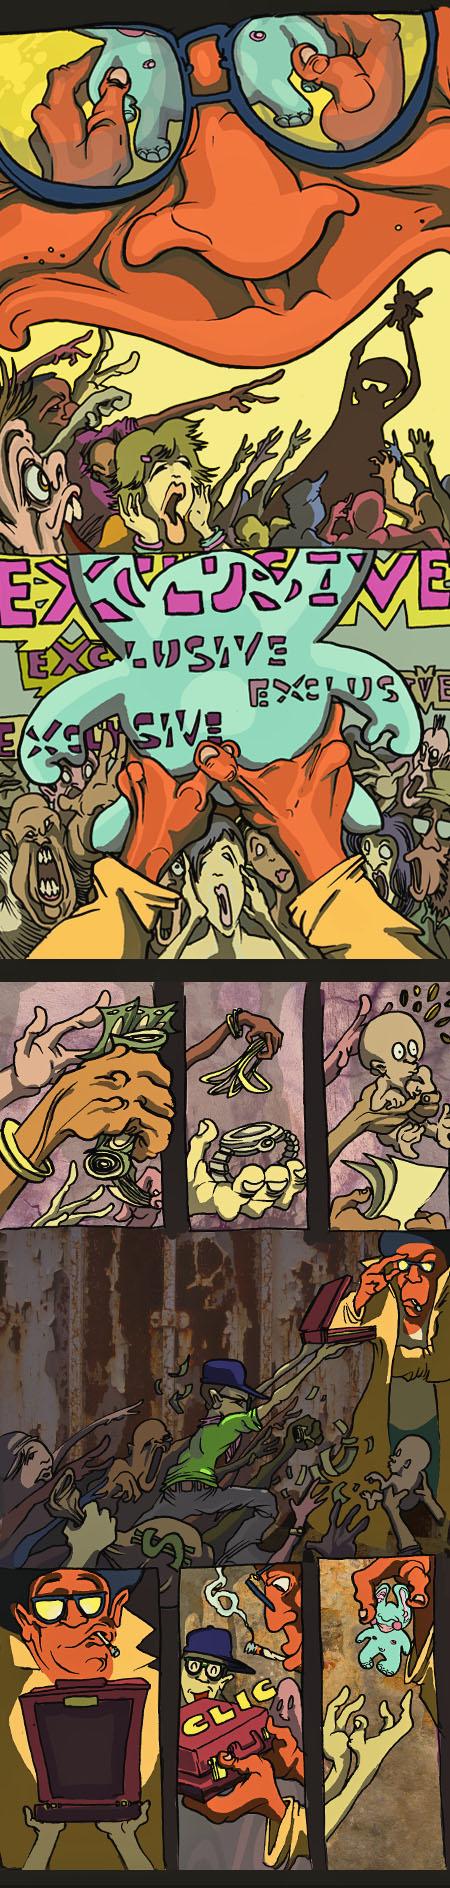 Predators of the Sprawl - Issue One